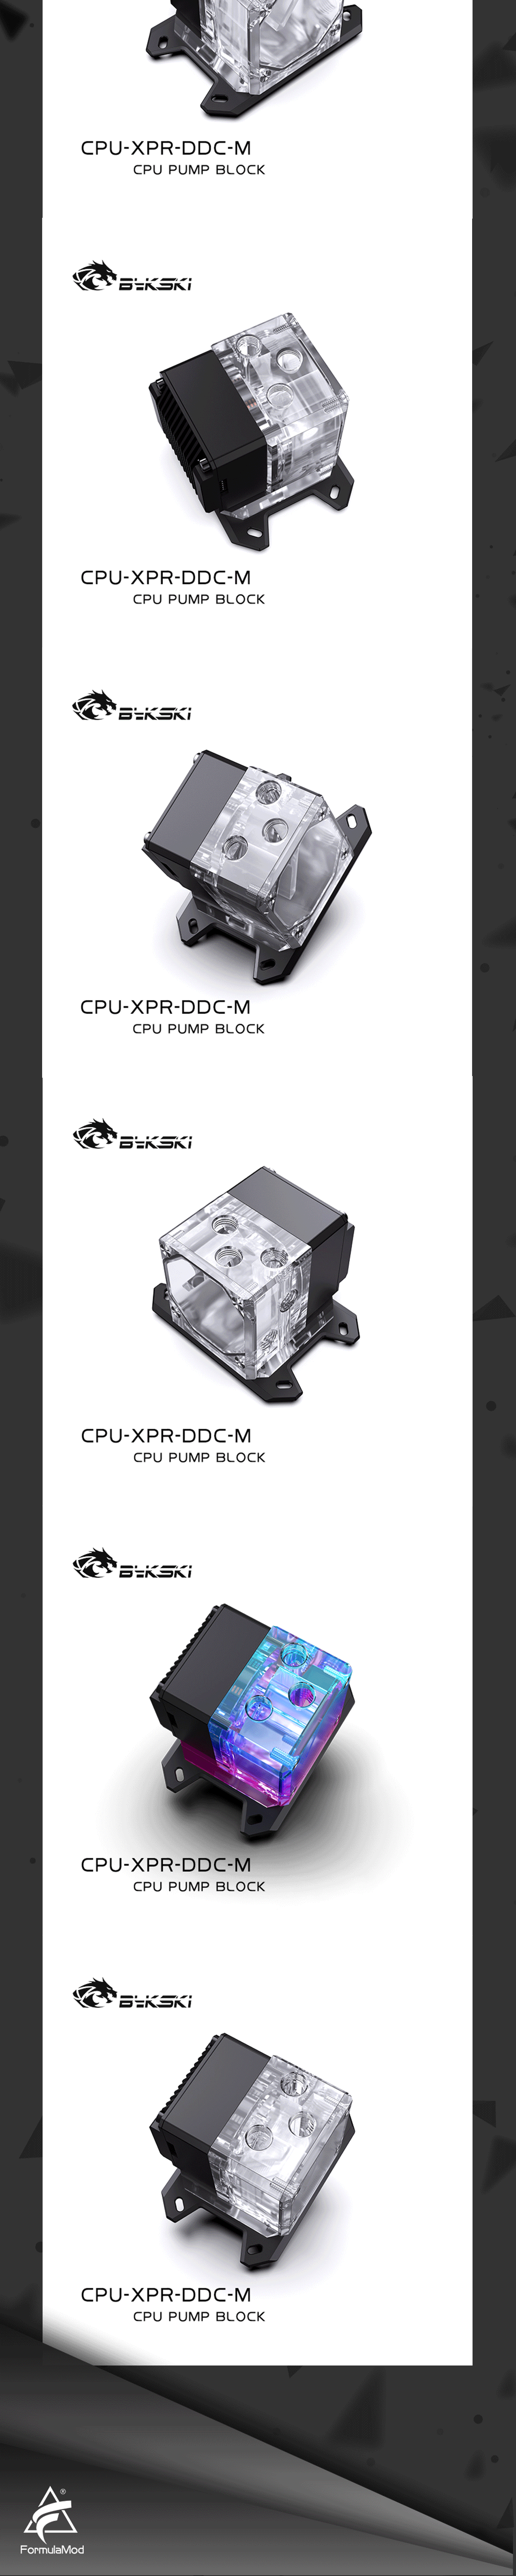 Bykski CPU-XPR-DDC-I CPU-XPR-DDC-M CPU Inter / AMD Water Pump ITX Motherboard I7 i9 AM4 for Computer Liquid Build Water Block